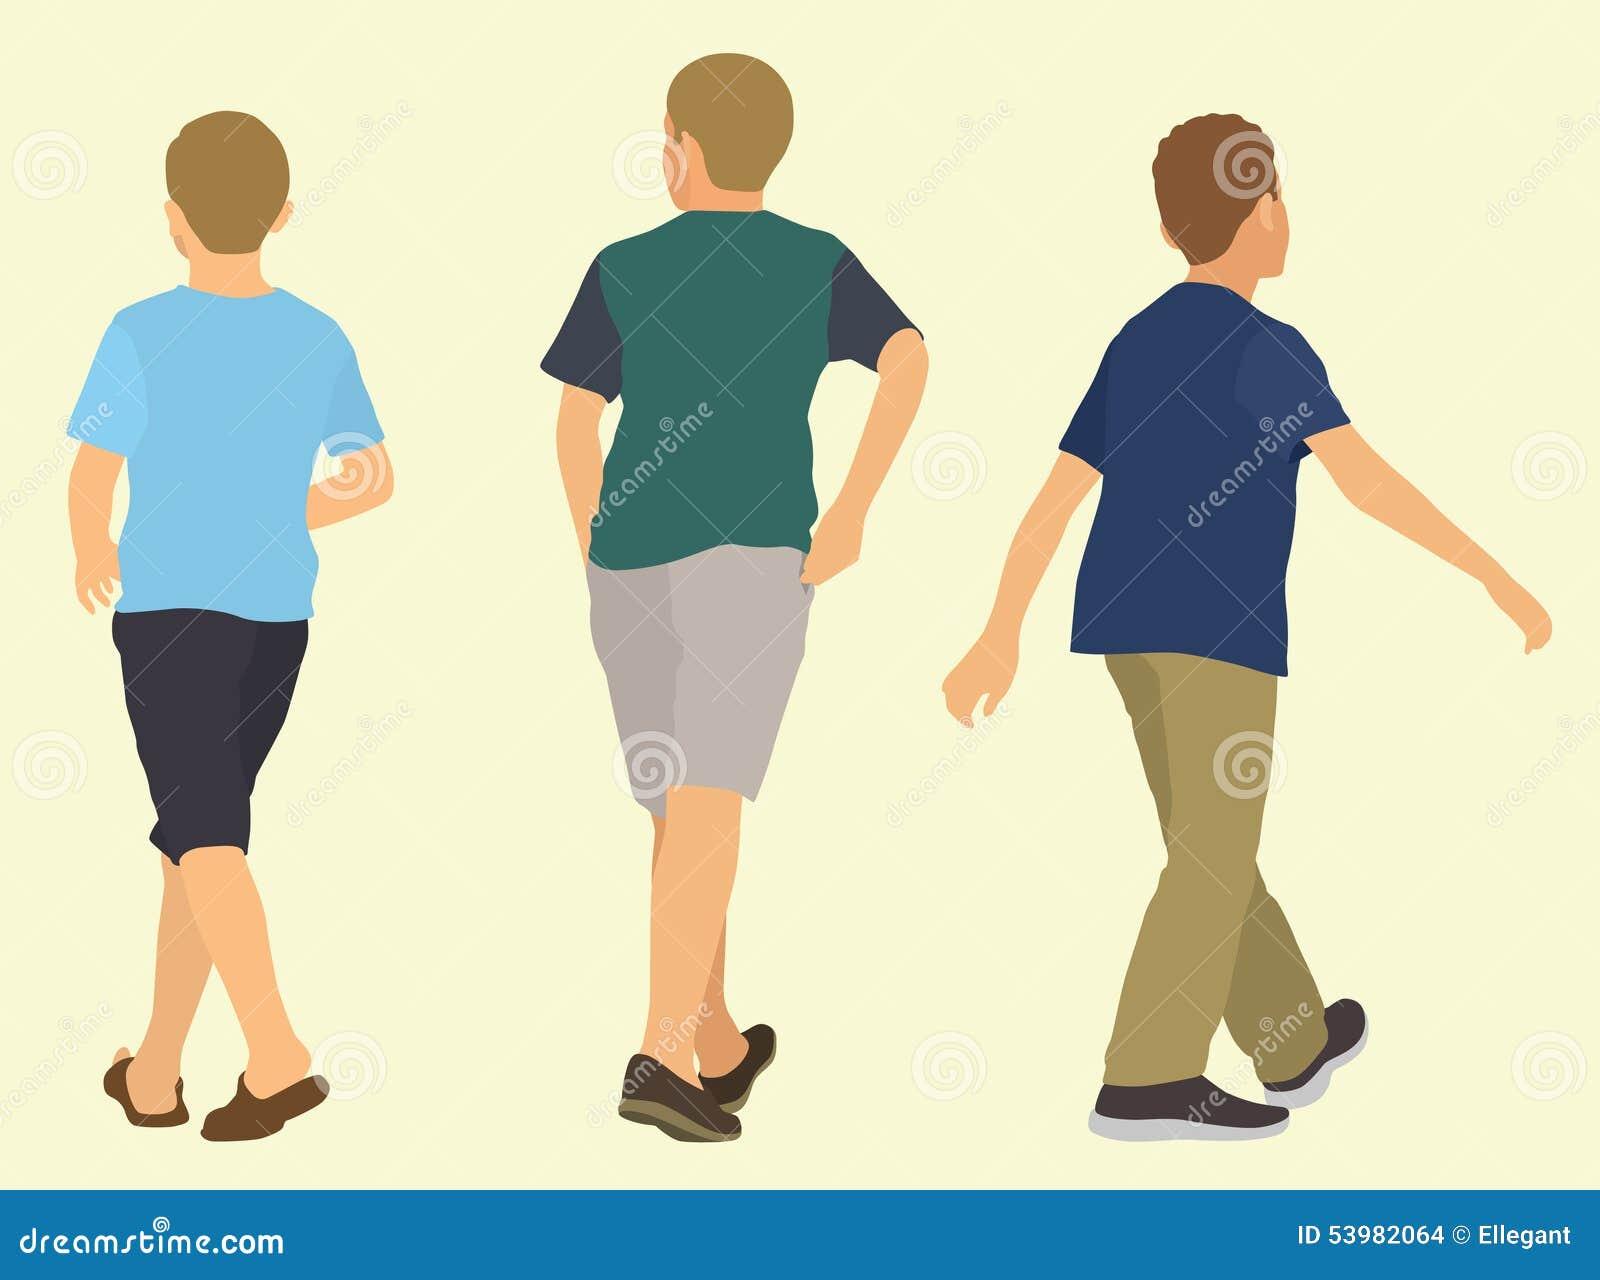 Young Boys que anda afastado